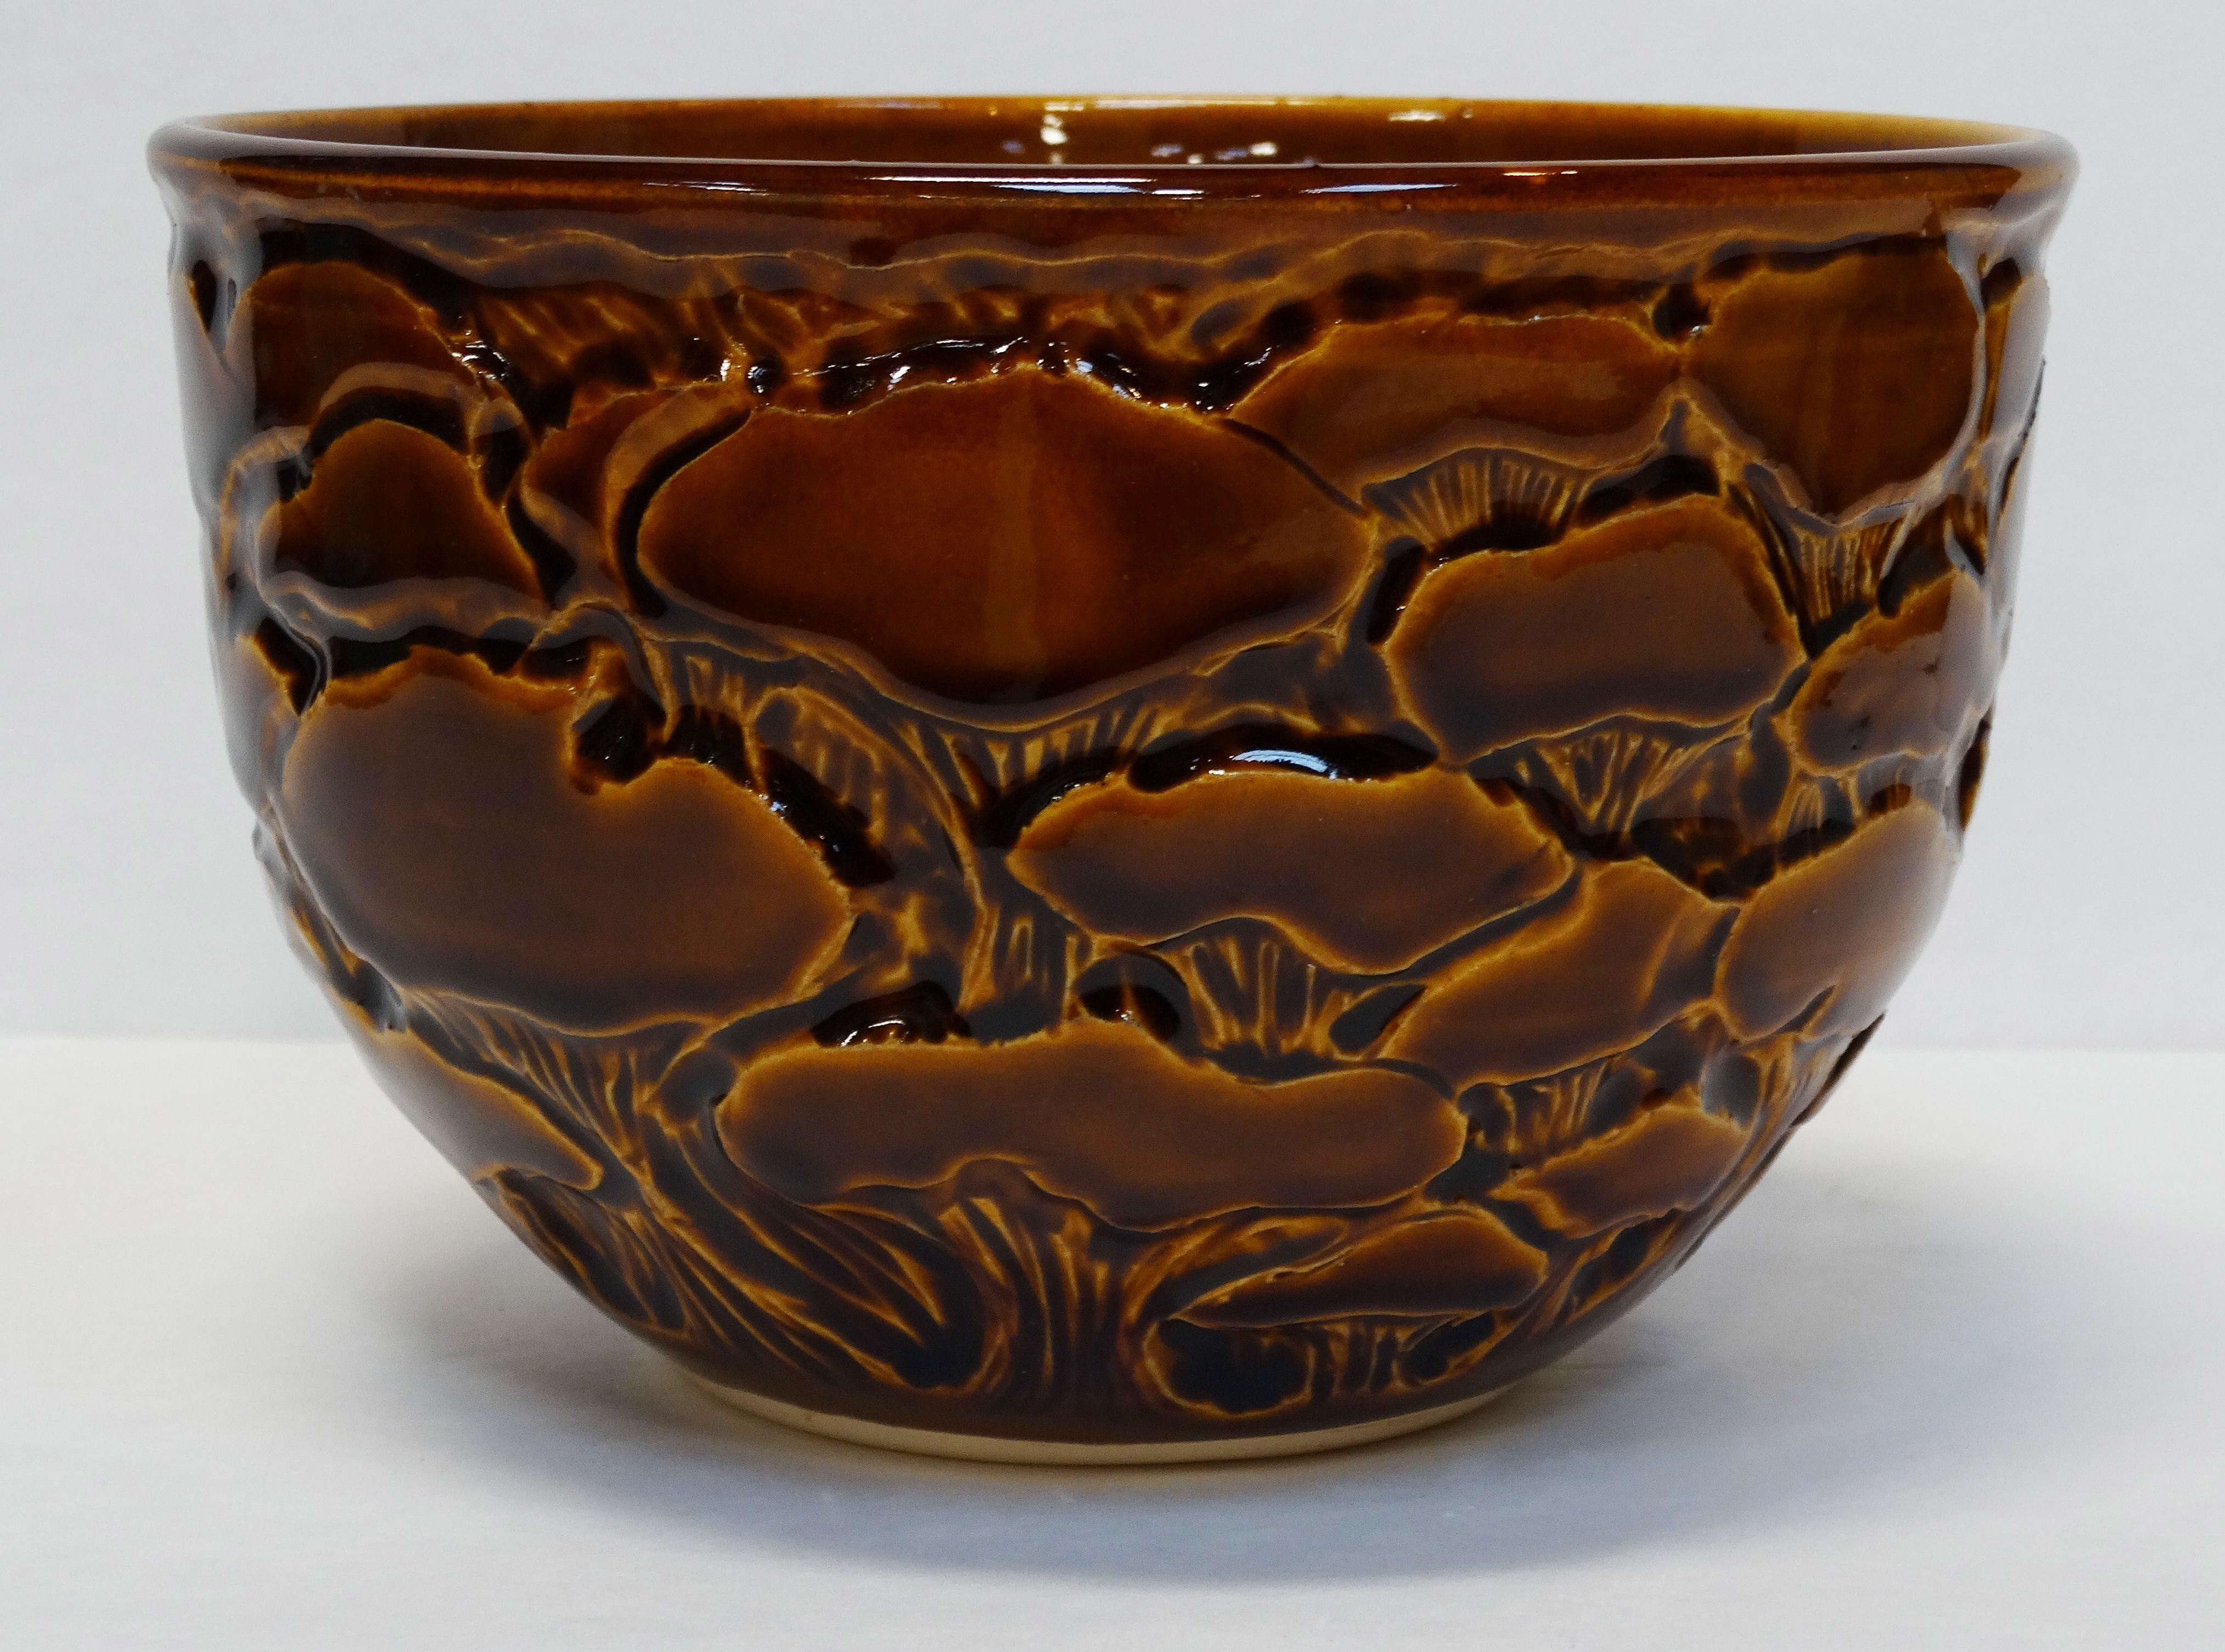 Mushroom bowl